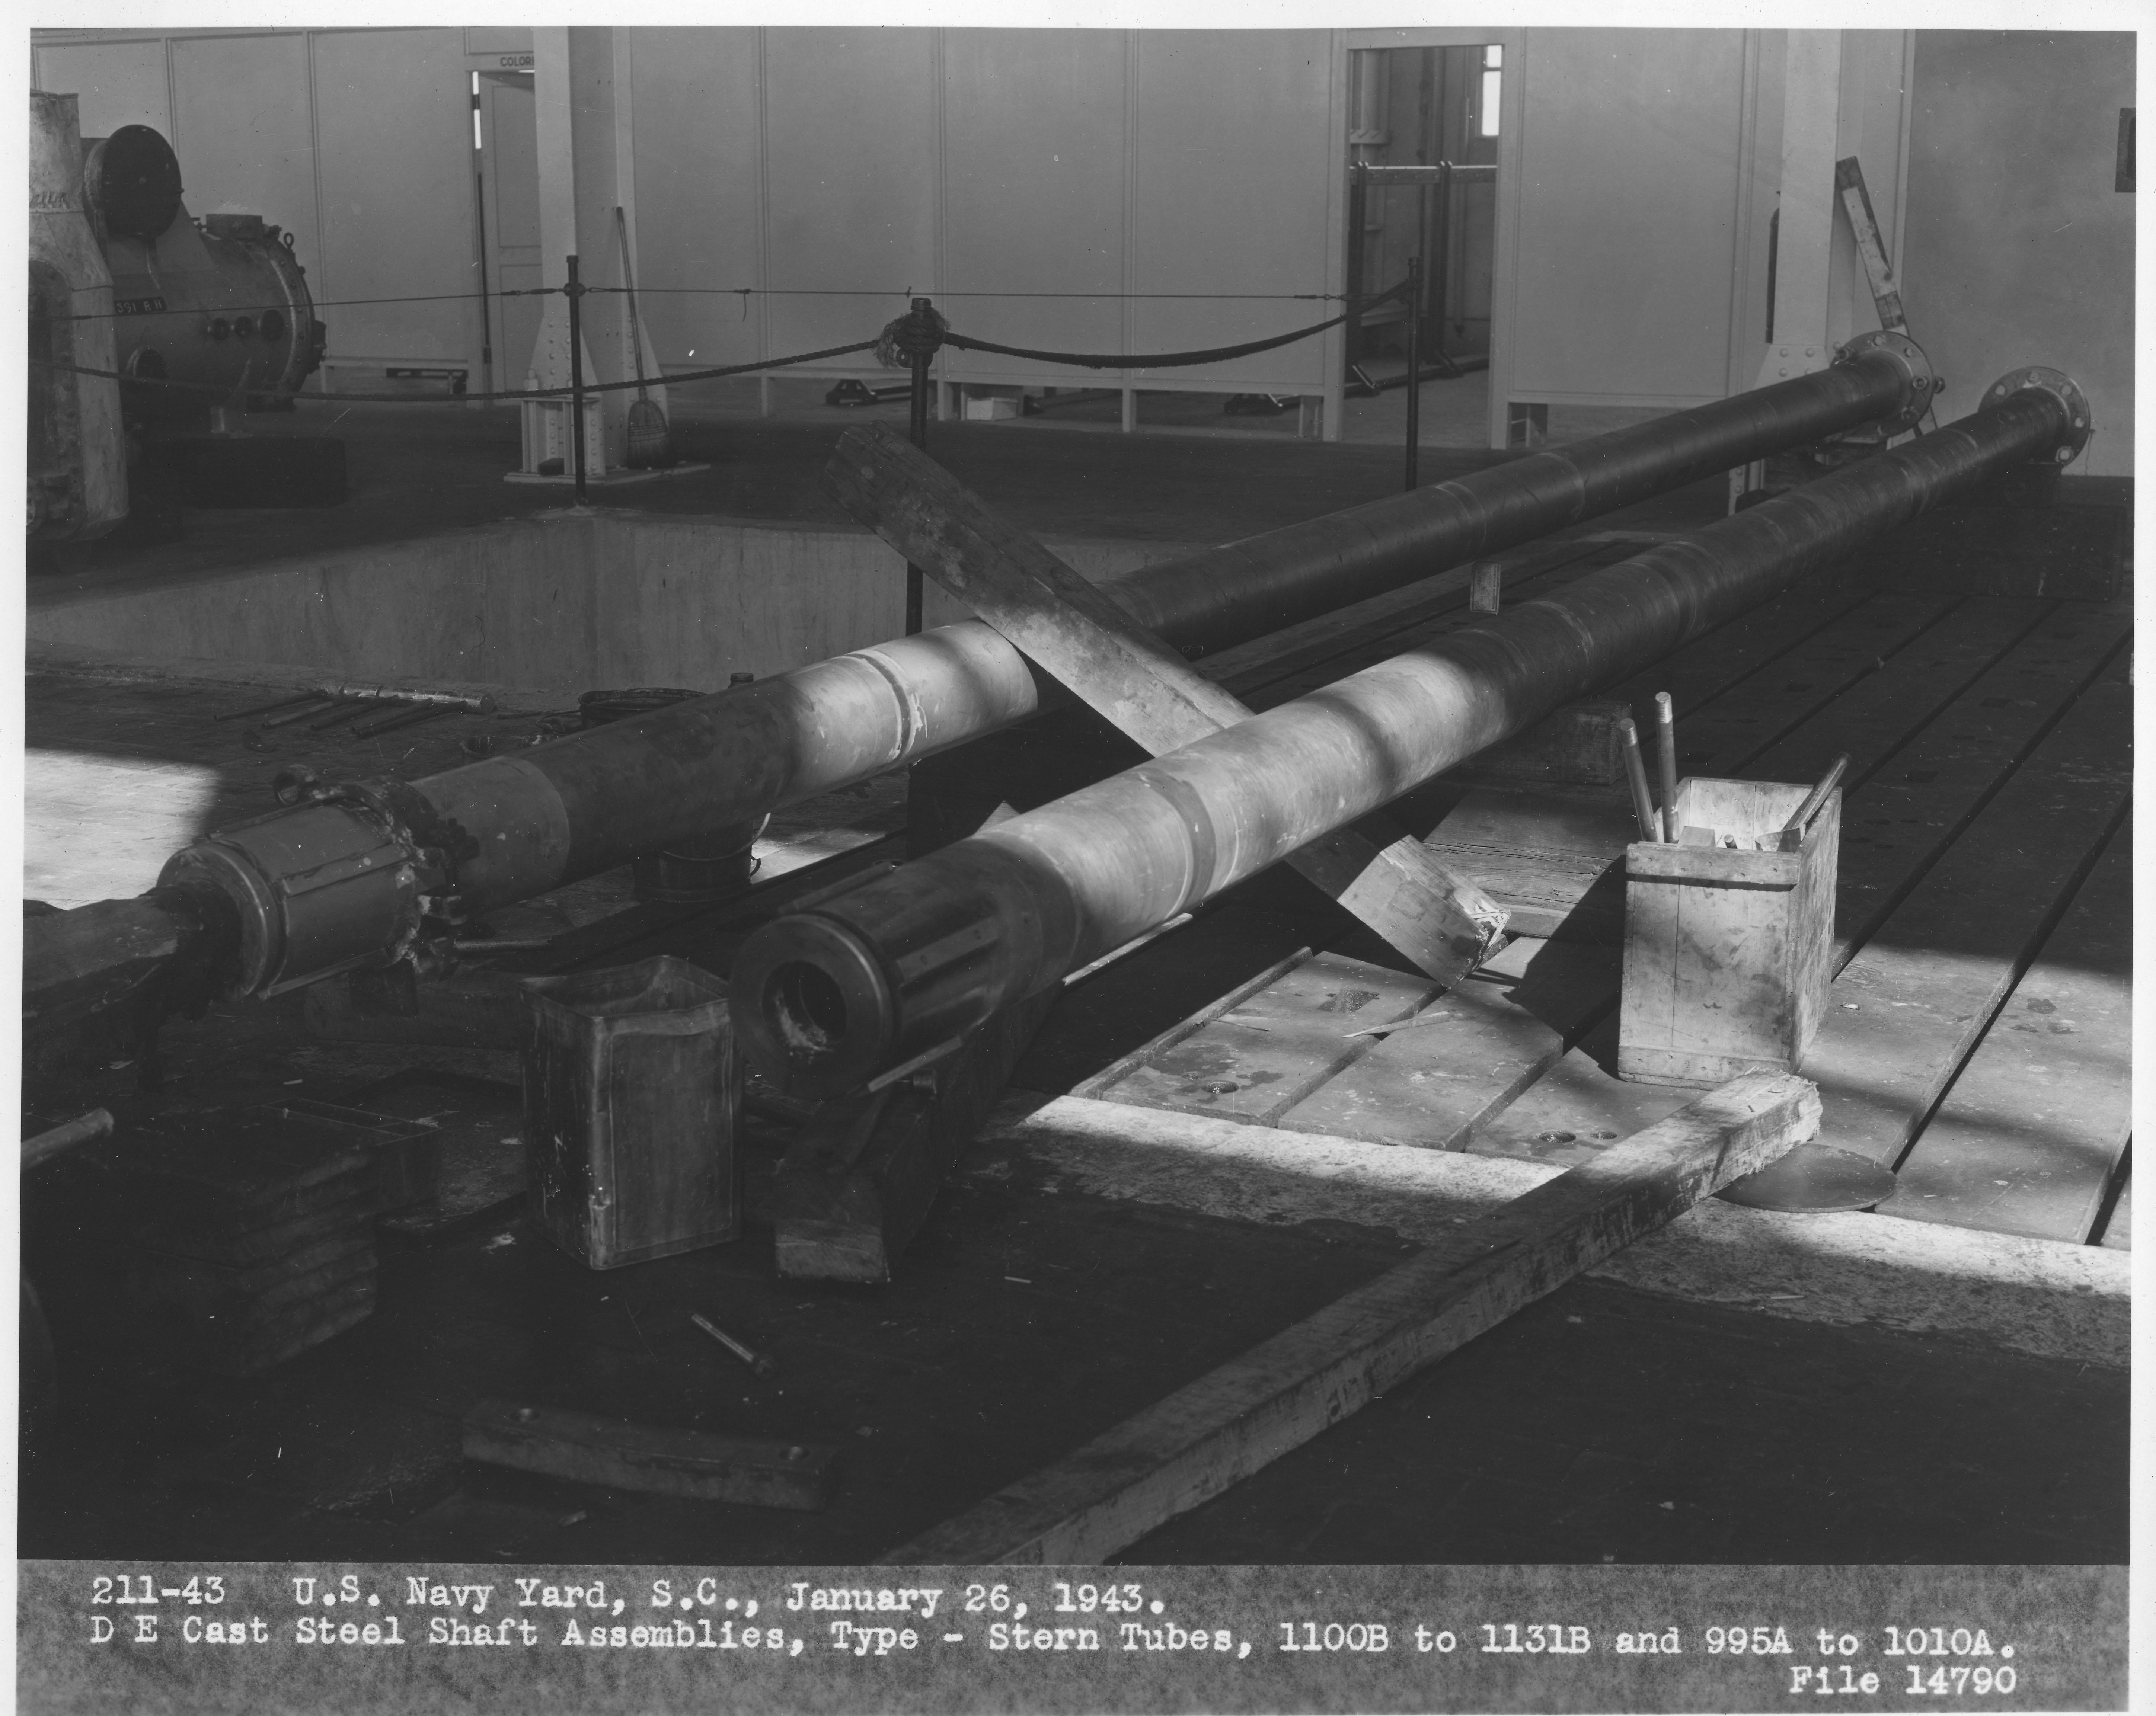 DE Cast Steel Shaft Assembly